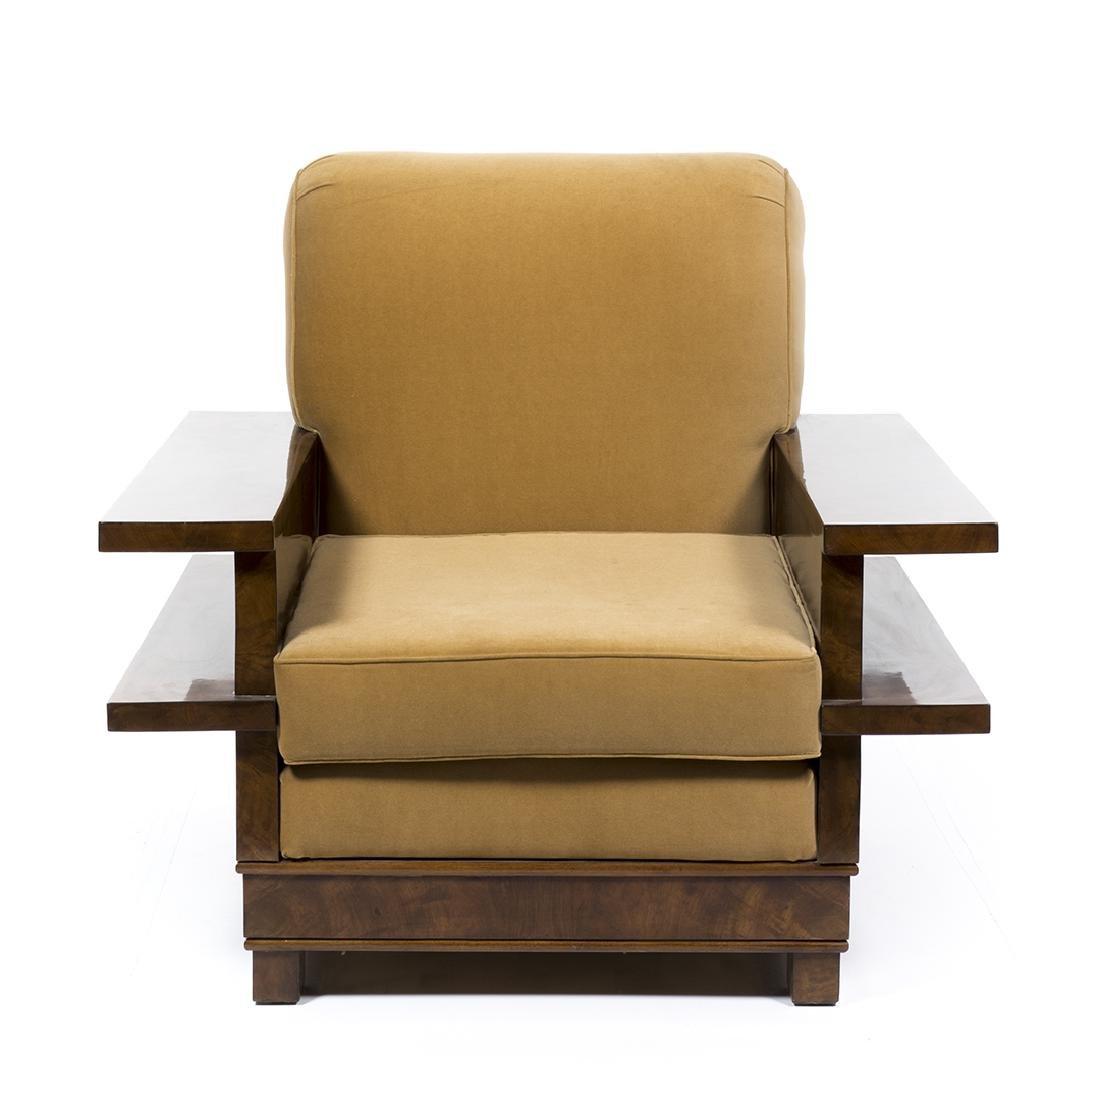 Italian Art Deco Club Chair - 2